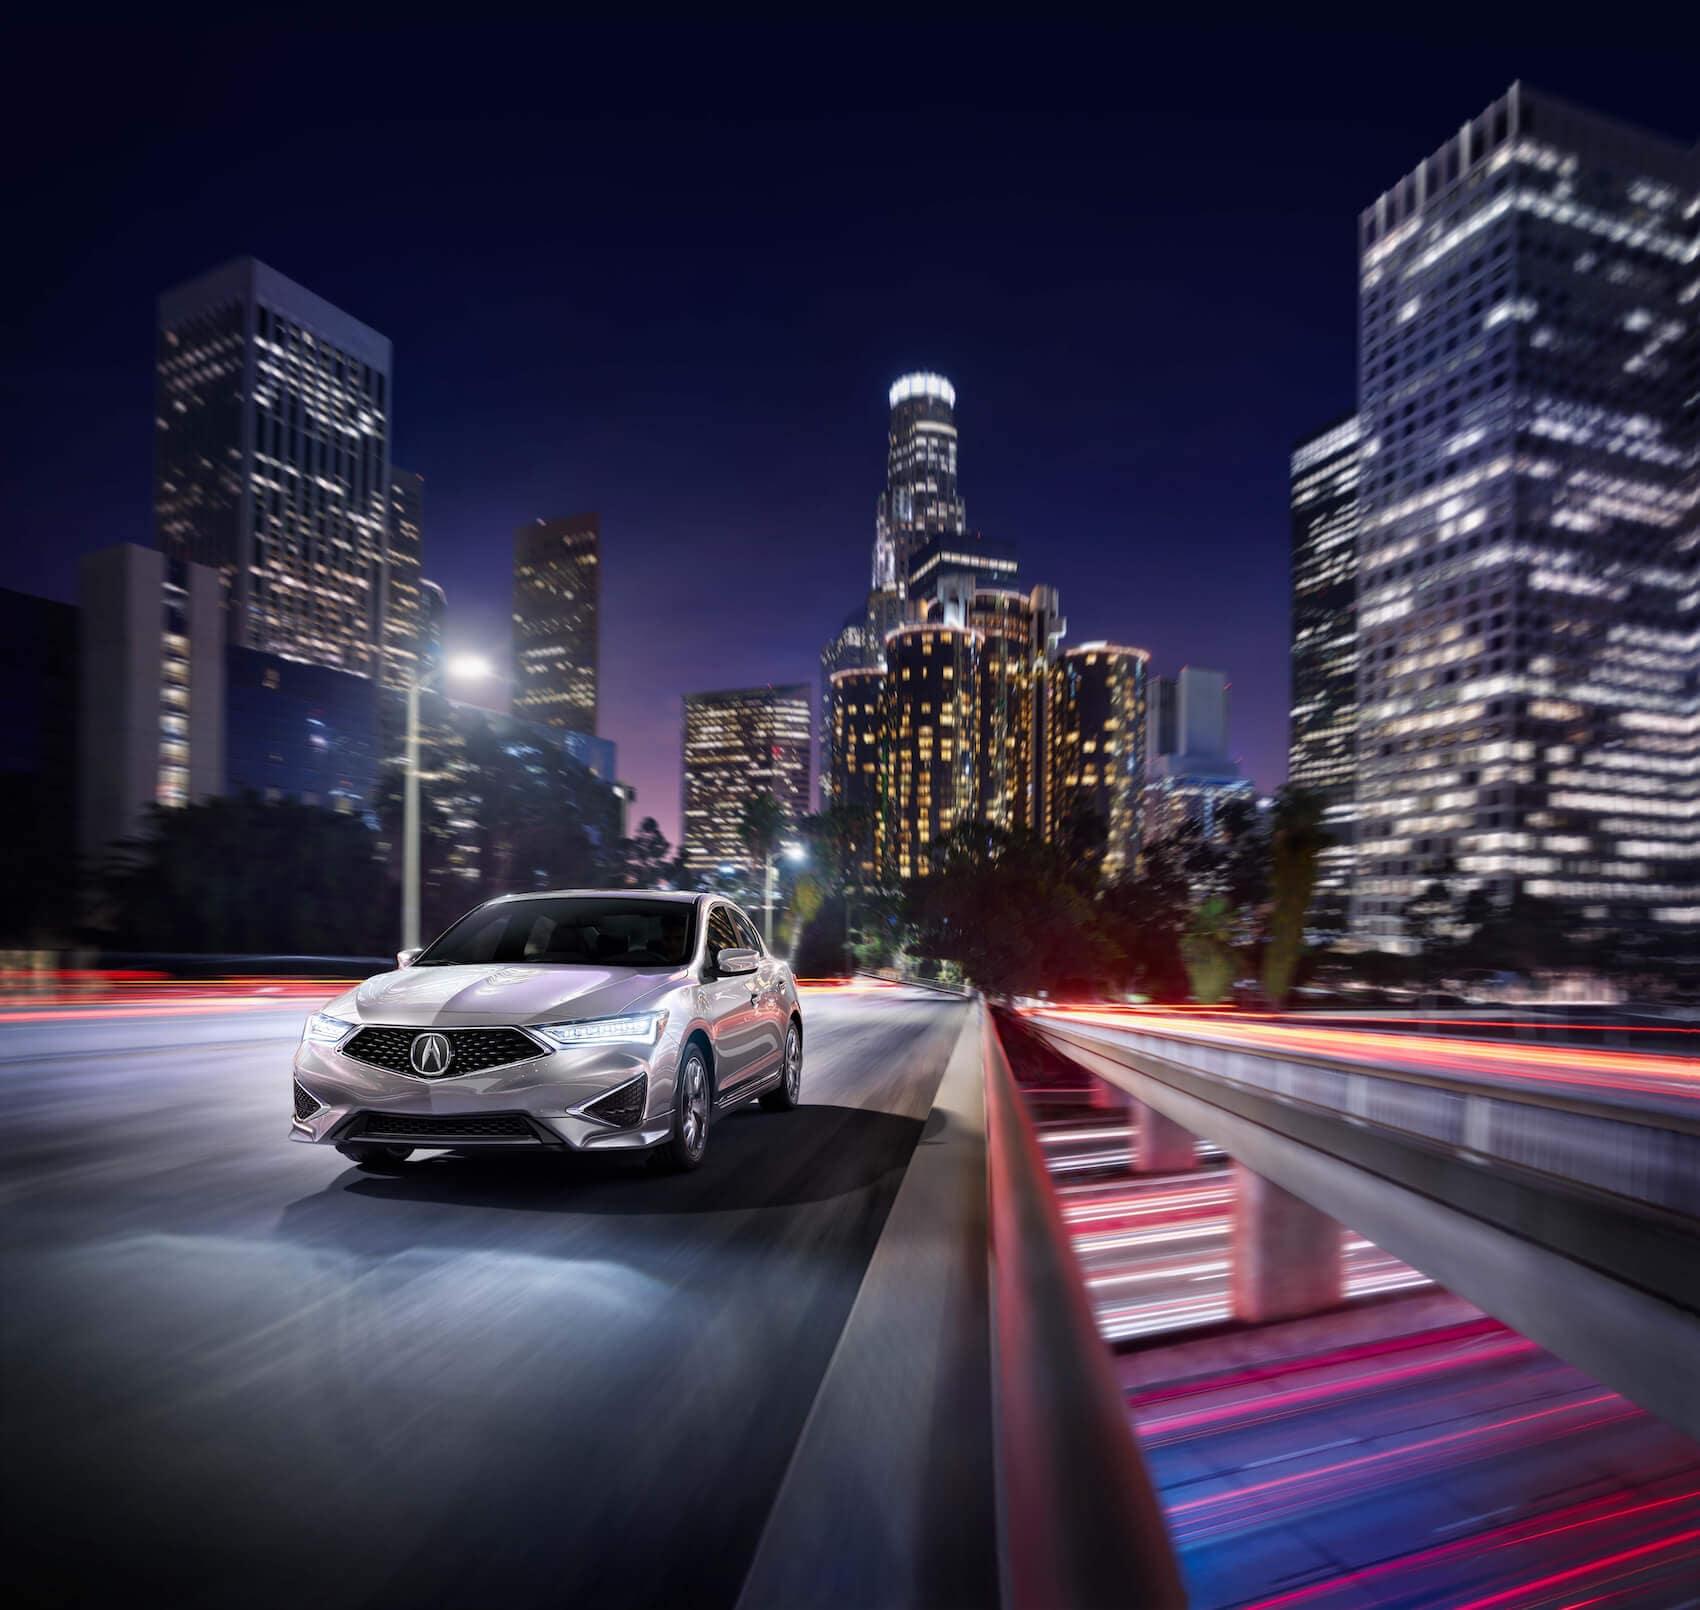 2020 Acura ILX trim levels Maple Shade, NJ